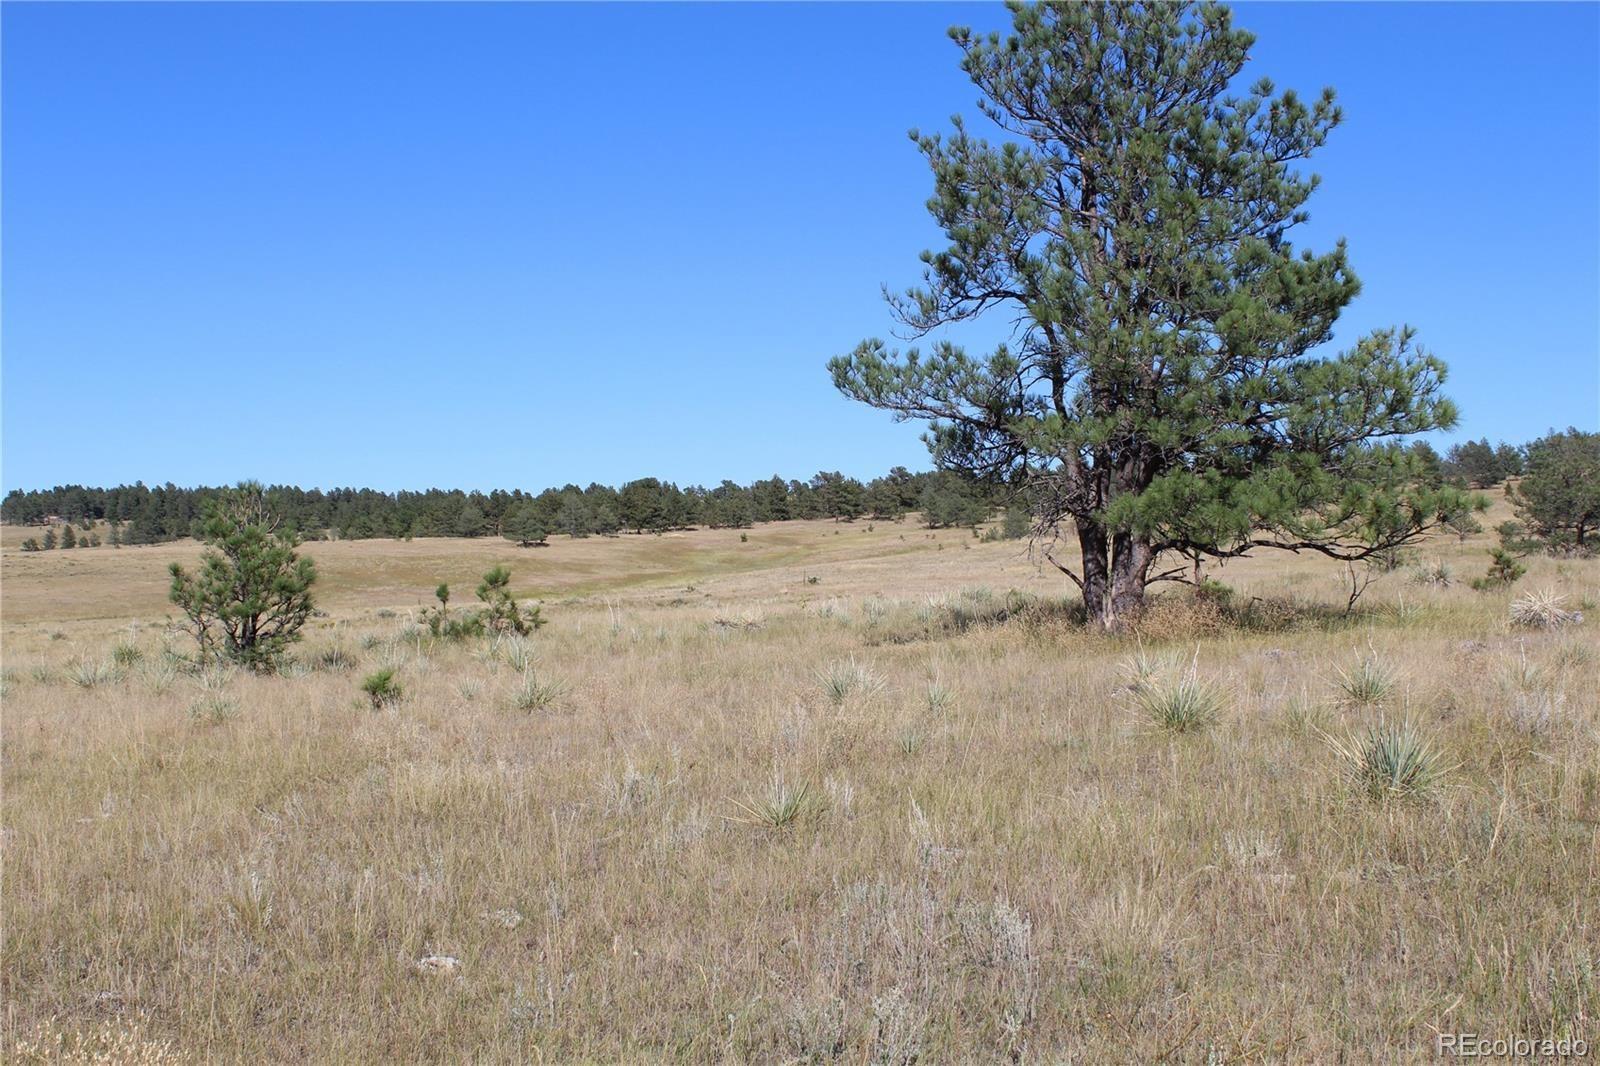 MLS# 2877174 - 13 - Cattle Circle, Kiowa, CO 80117